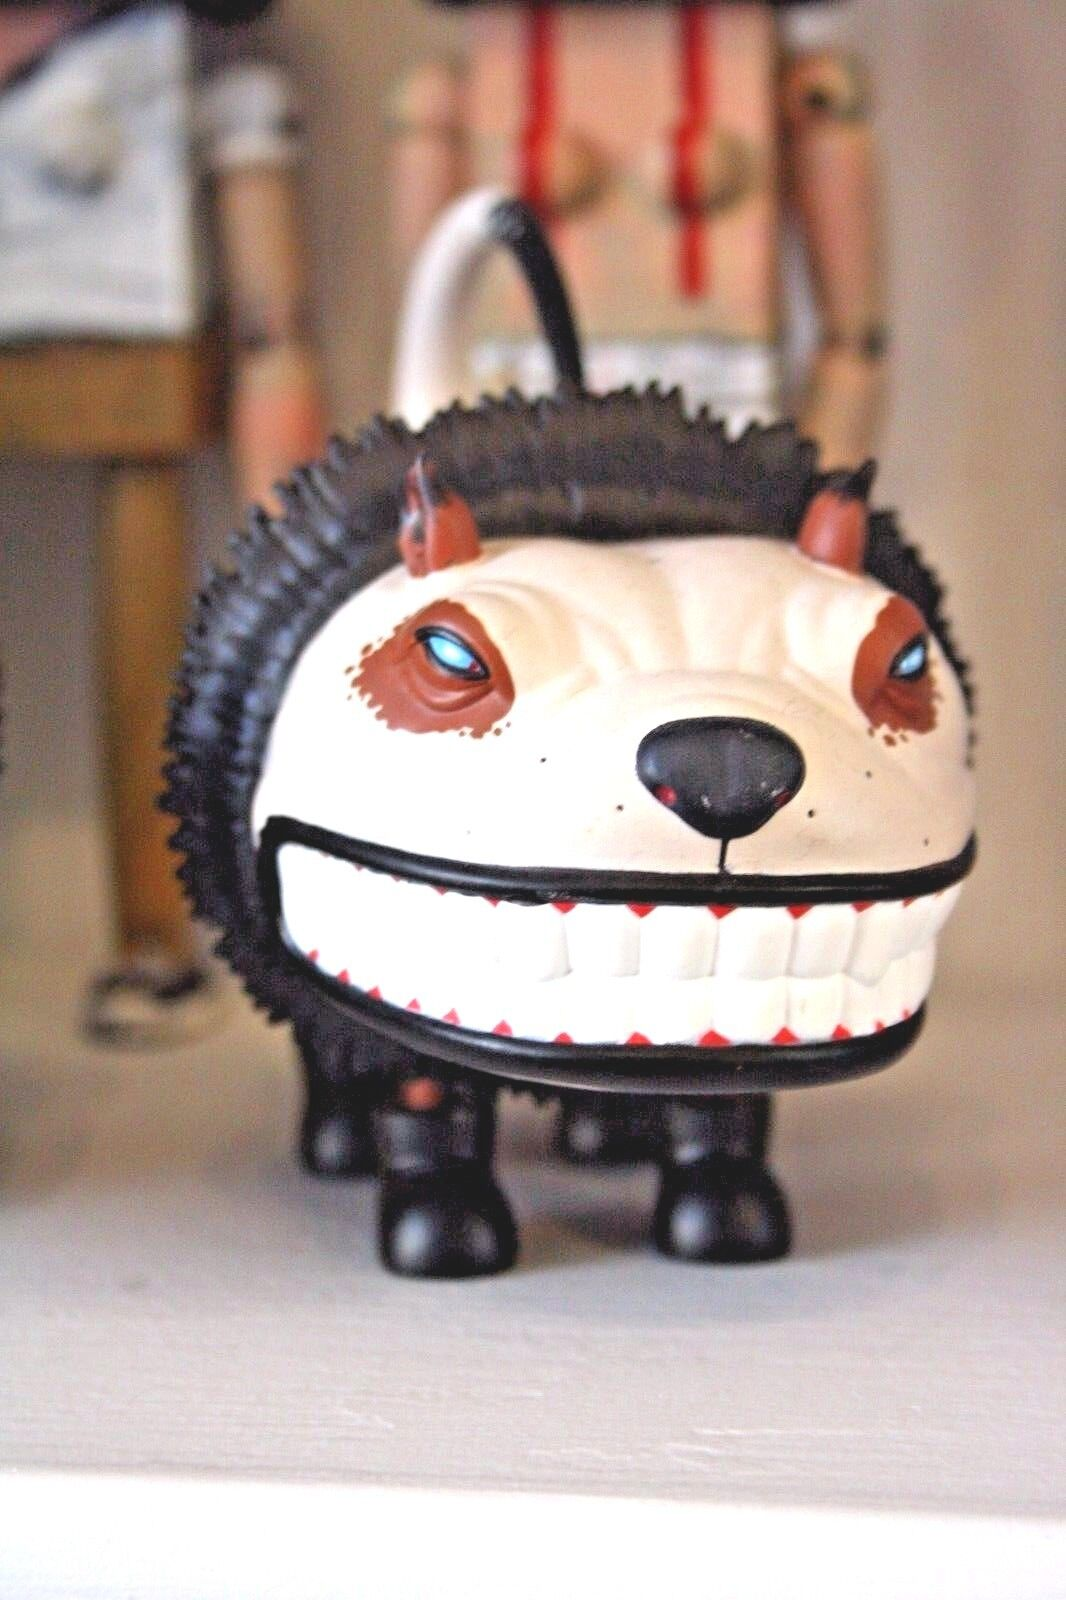 SCOTT MUSGROVE StrangeCo Designer Toy avvioED GLAMOUR CAT CAT CAT 5 NATURAL Marroneee cce5b3